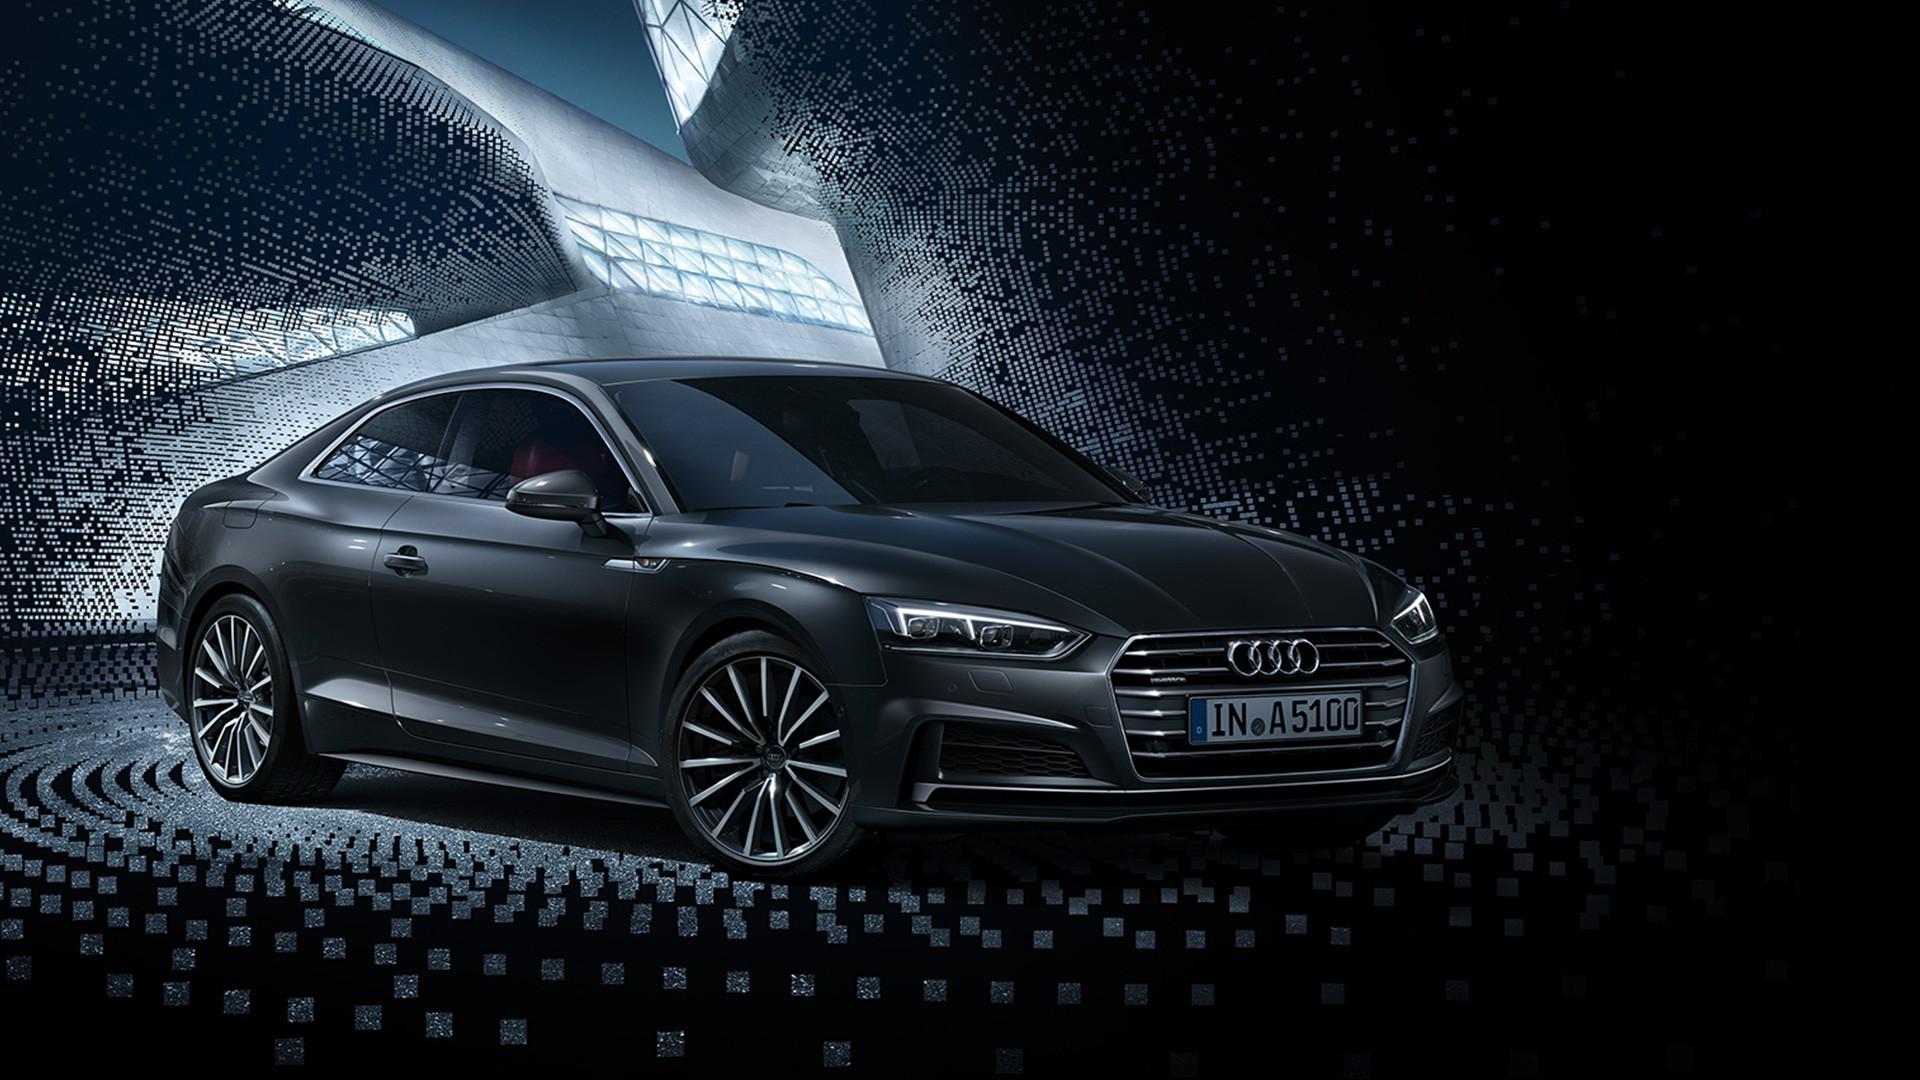 2017 Audi A5 Wallpaper Hd Audi S5 Coupe 2018 2970541 Hd Wallpaper Backgrounds Download